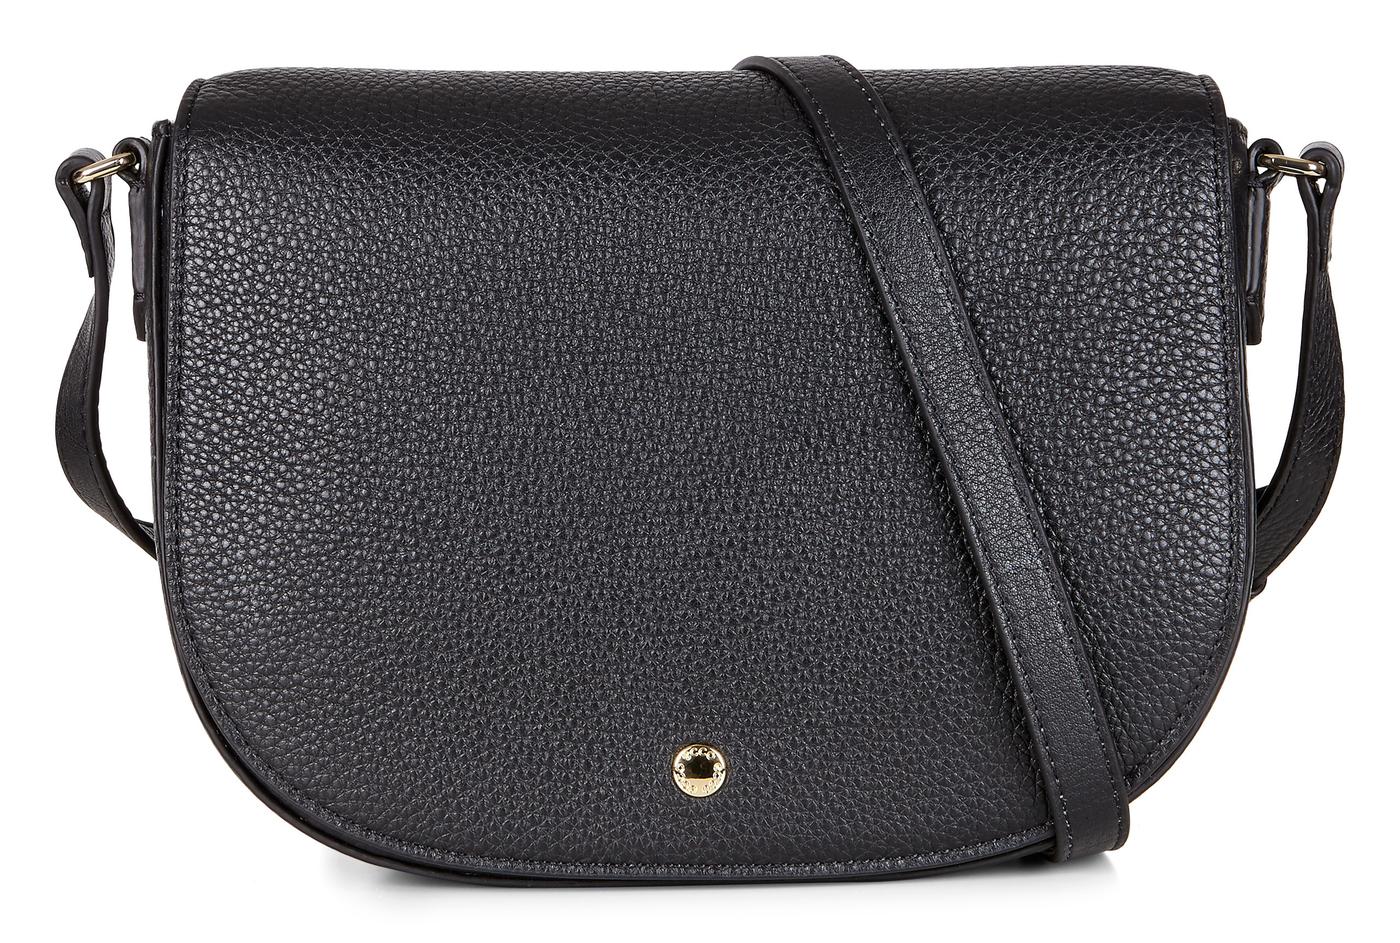 89893dd0b5 ECCO Kauai Medium Saddle Bag | Chic Bags | ECCO® Shoes